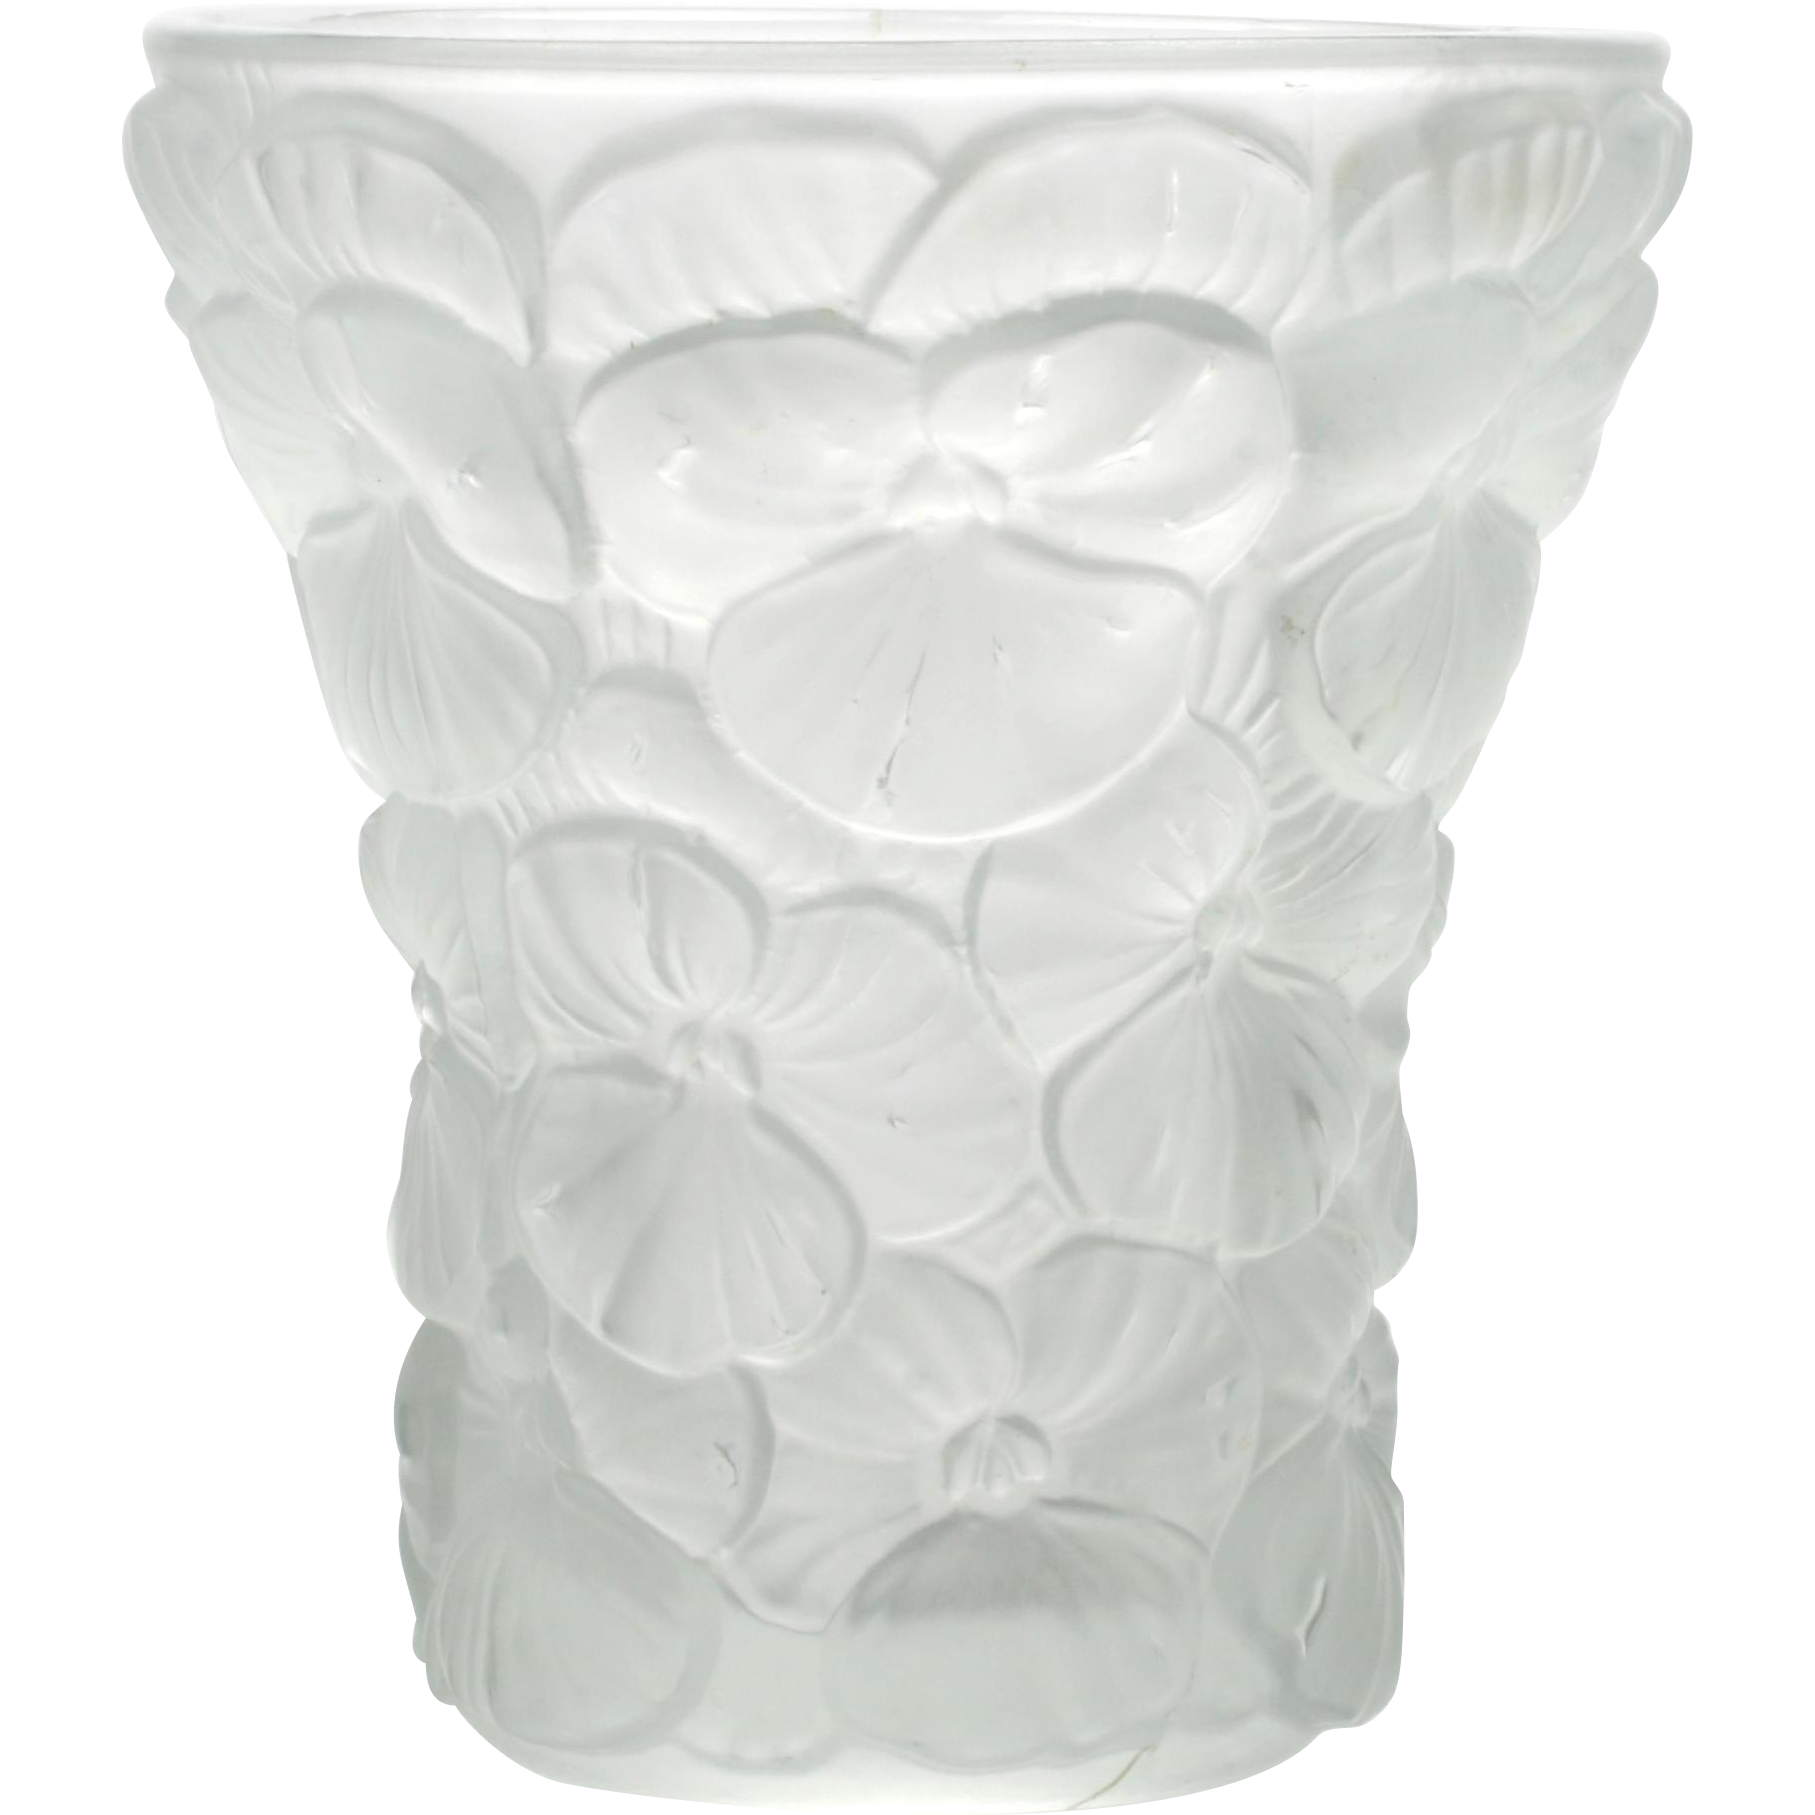 Czechoslovakia Inwald Barolac Art Glass Pansies Vase Czech Vintage Crystal